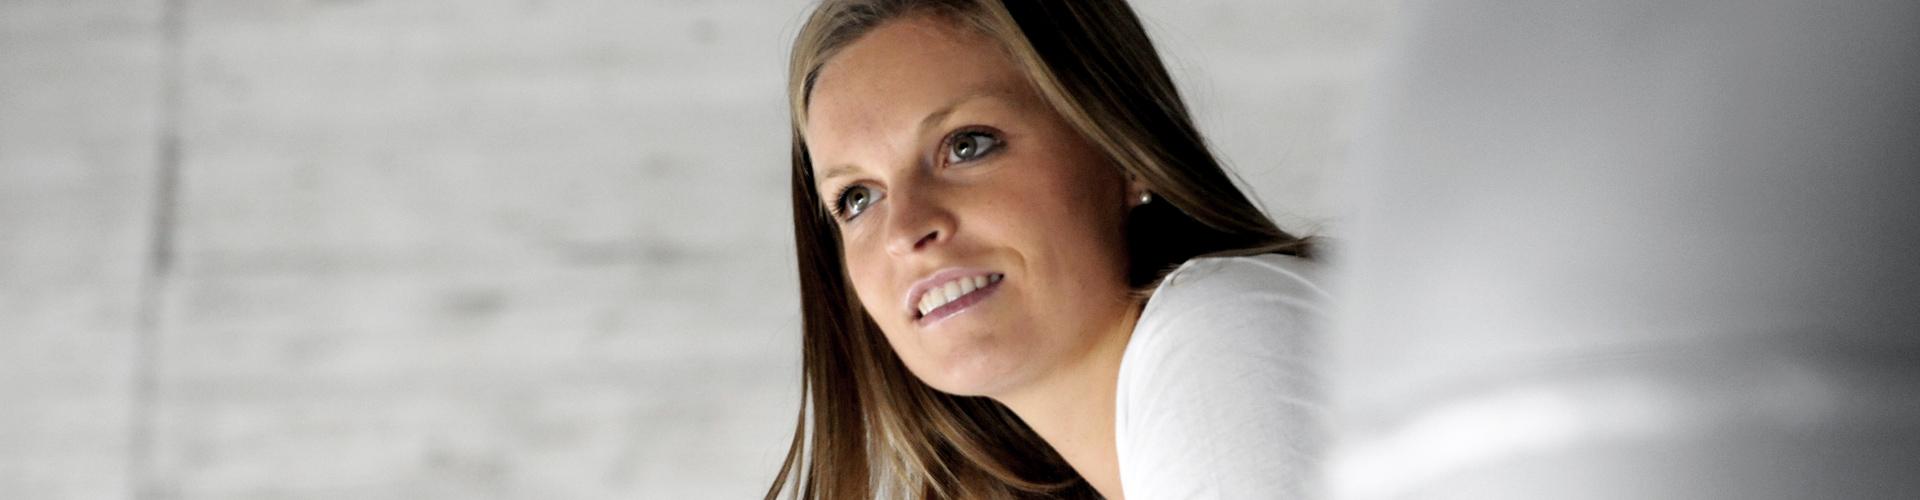 Moelgg-Manuela-Skifahrer-Portrait.jpg